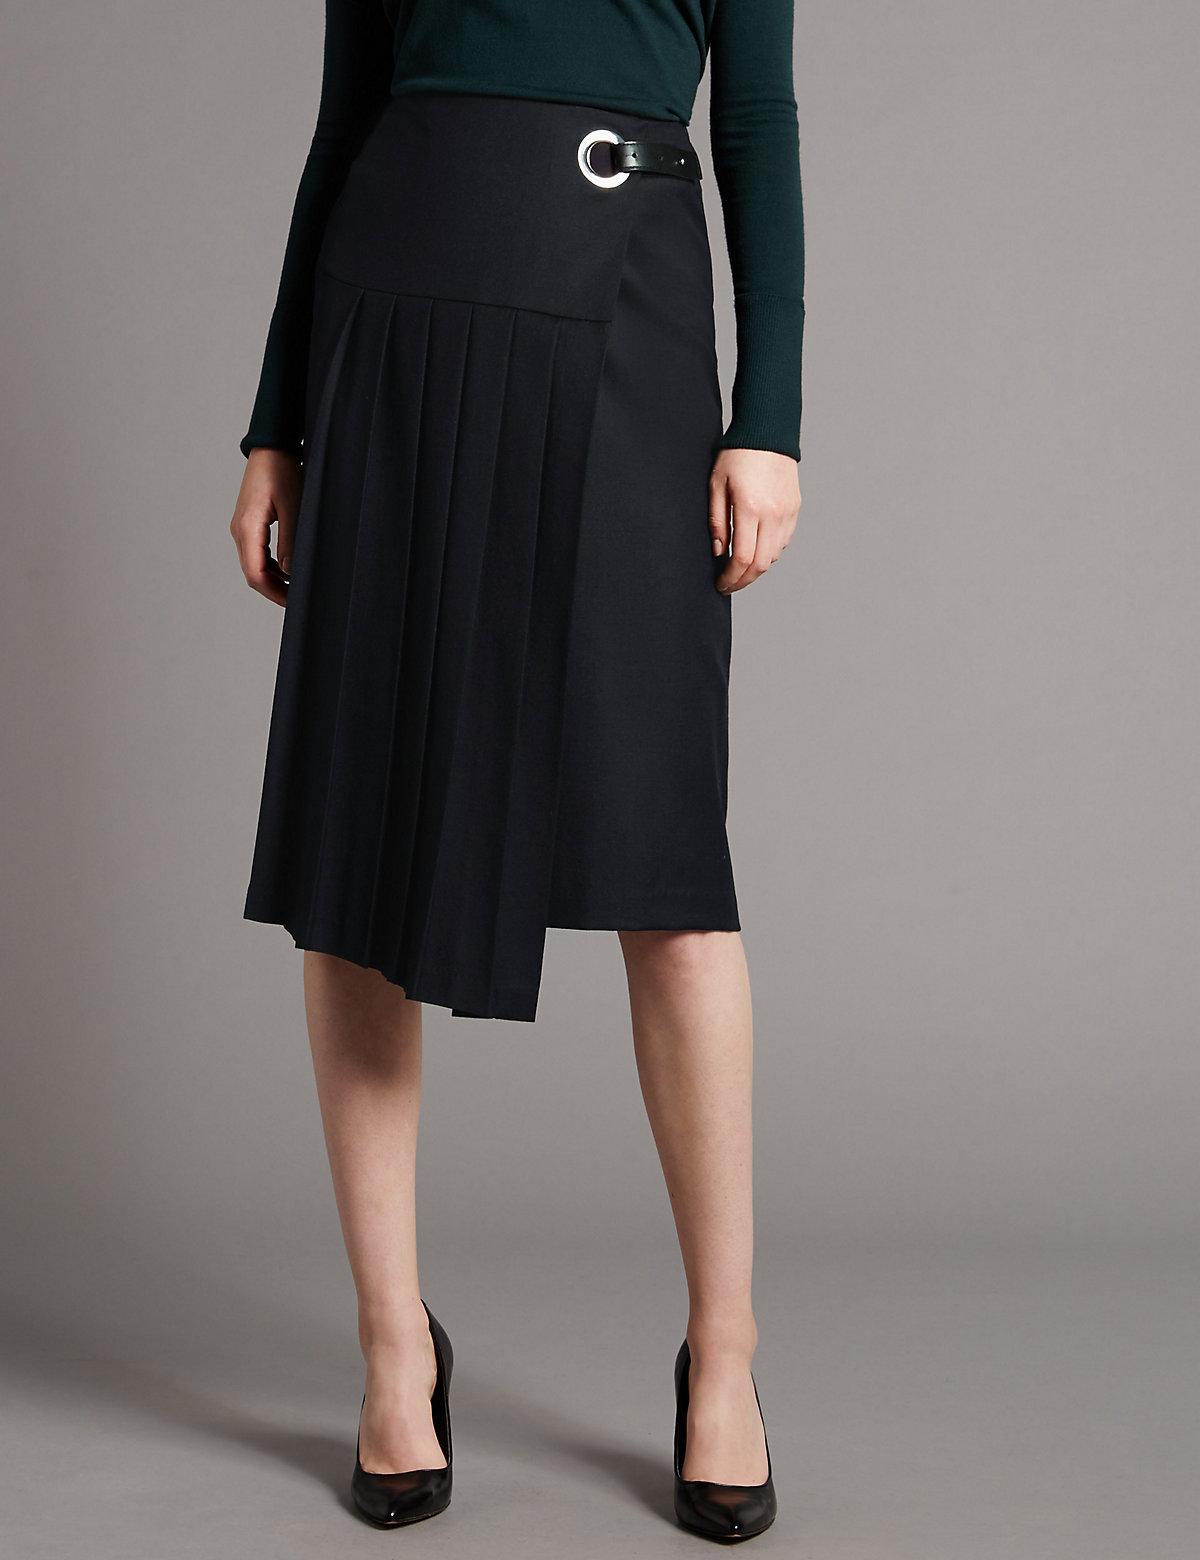 Autograph Kilt Pleat A-line Skirt With Wool